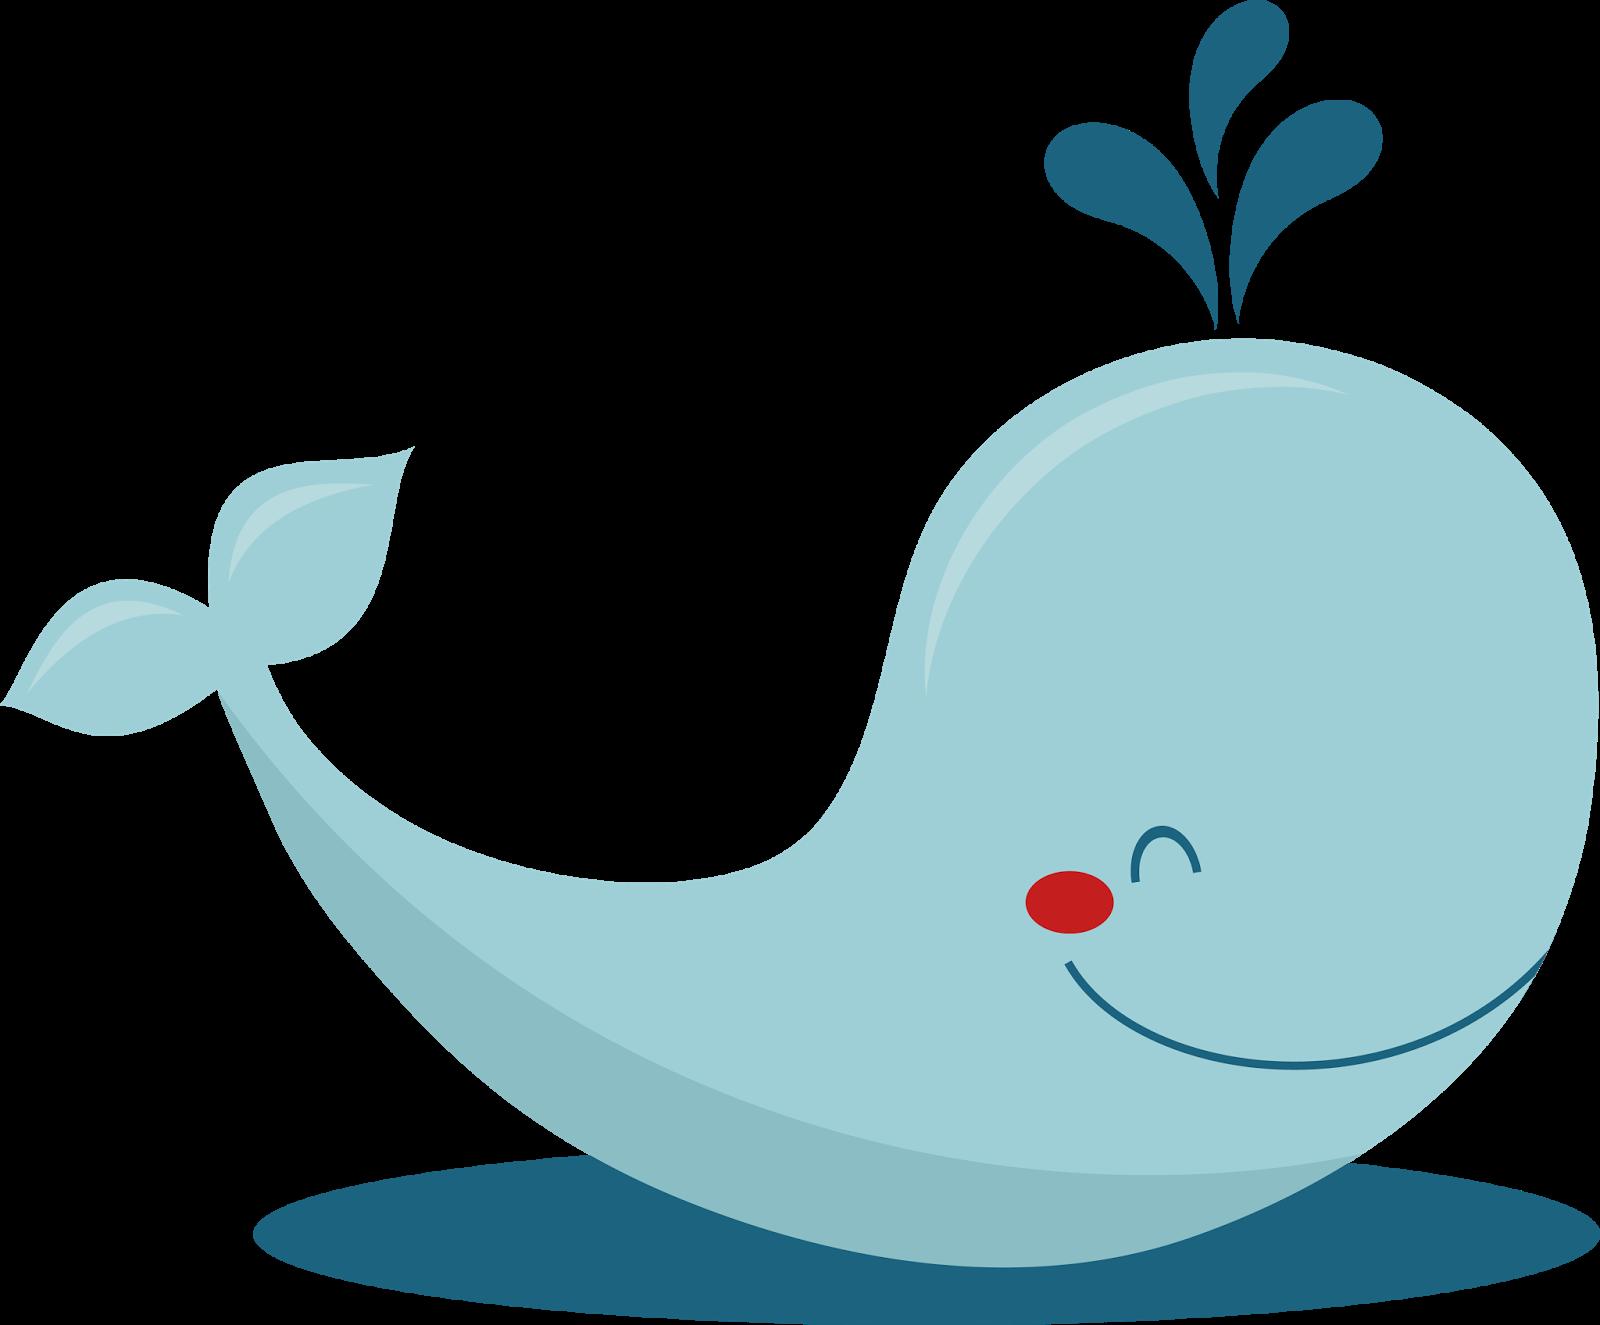 Whale clip art images free clipart